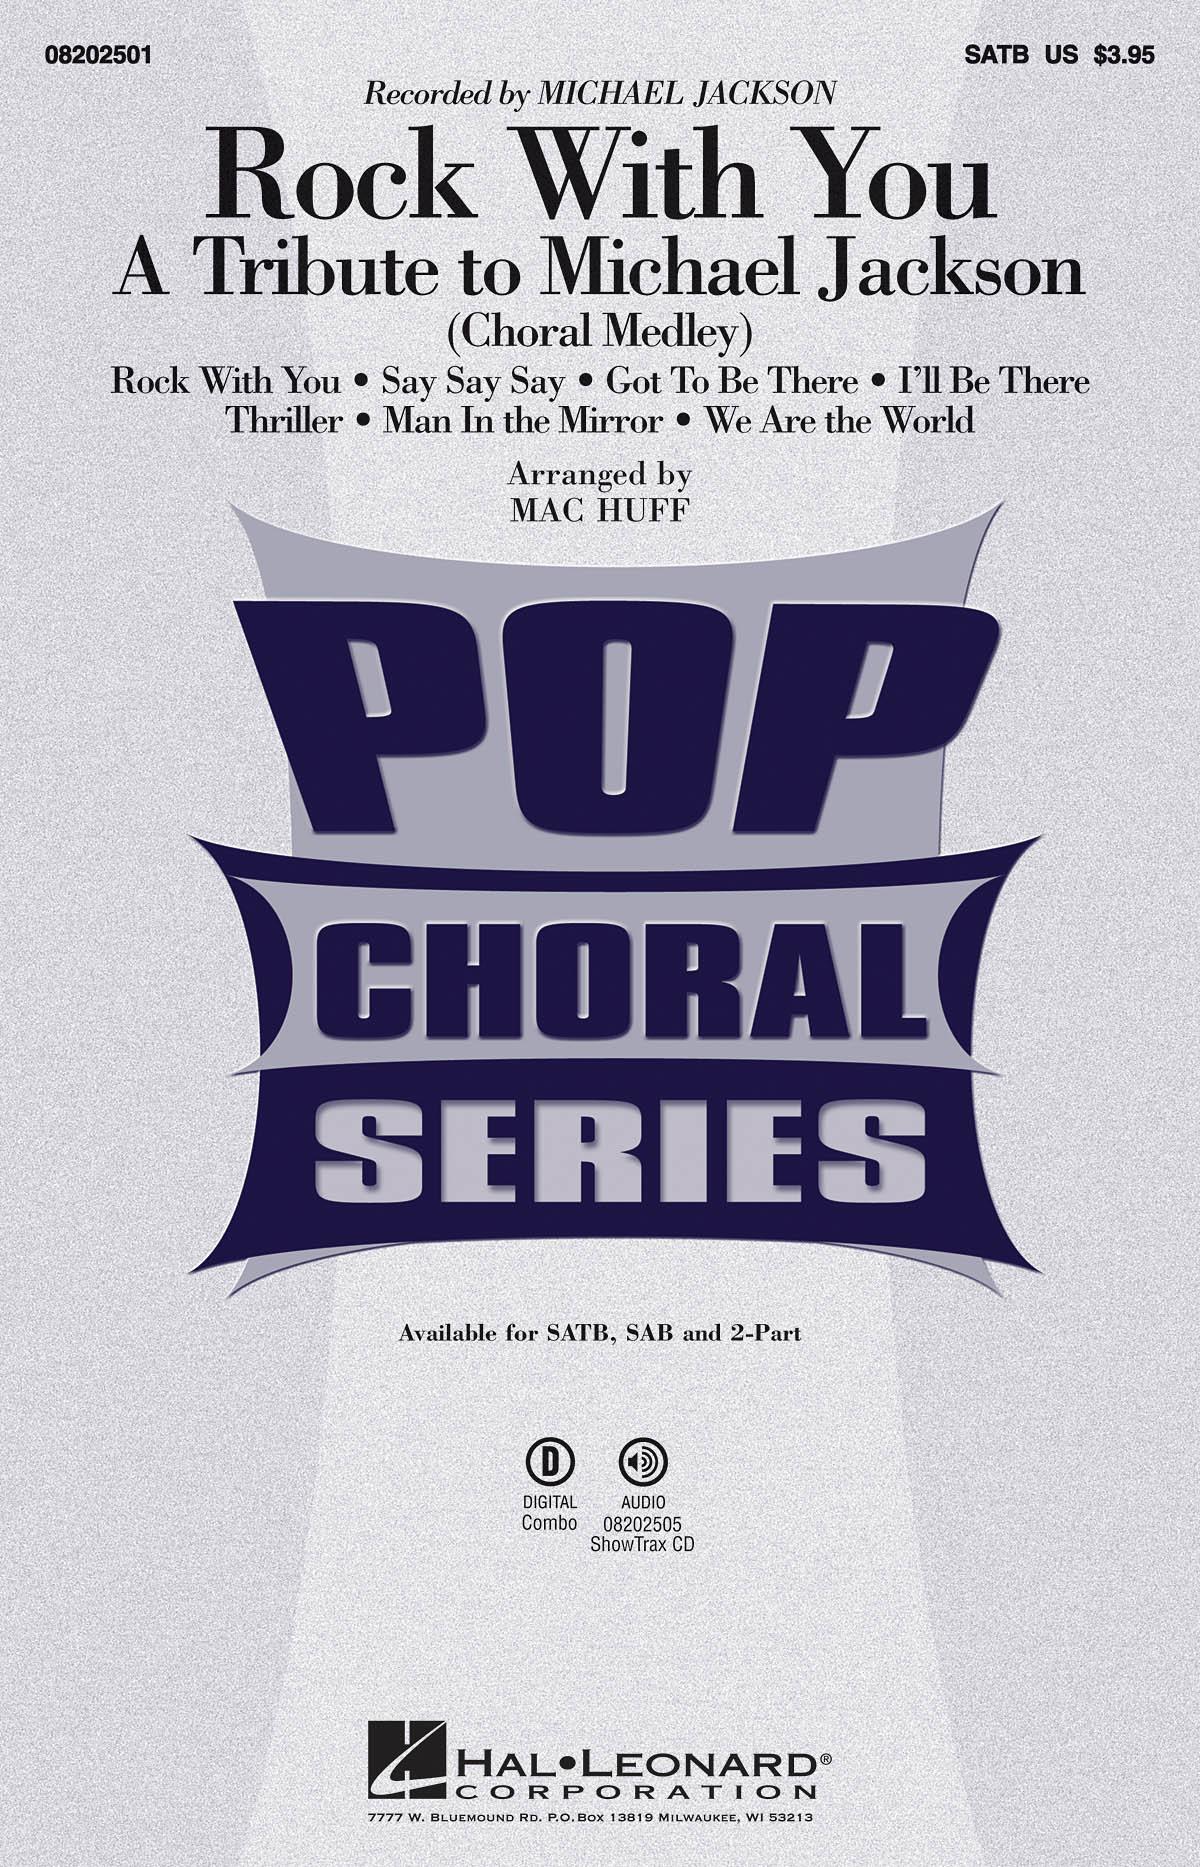 Michael Jackson: Rock with You - A Tribute to Michael Jackson: SATB: Vocal Score